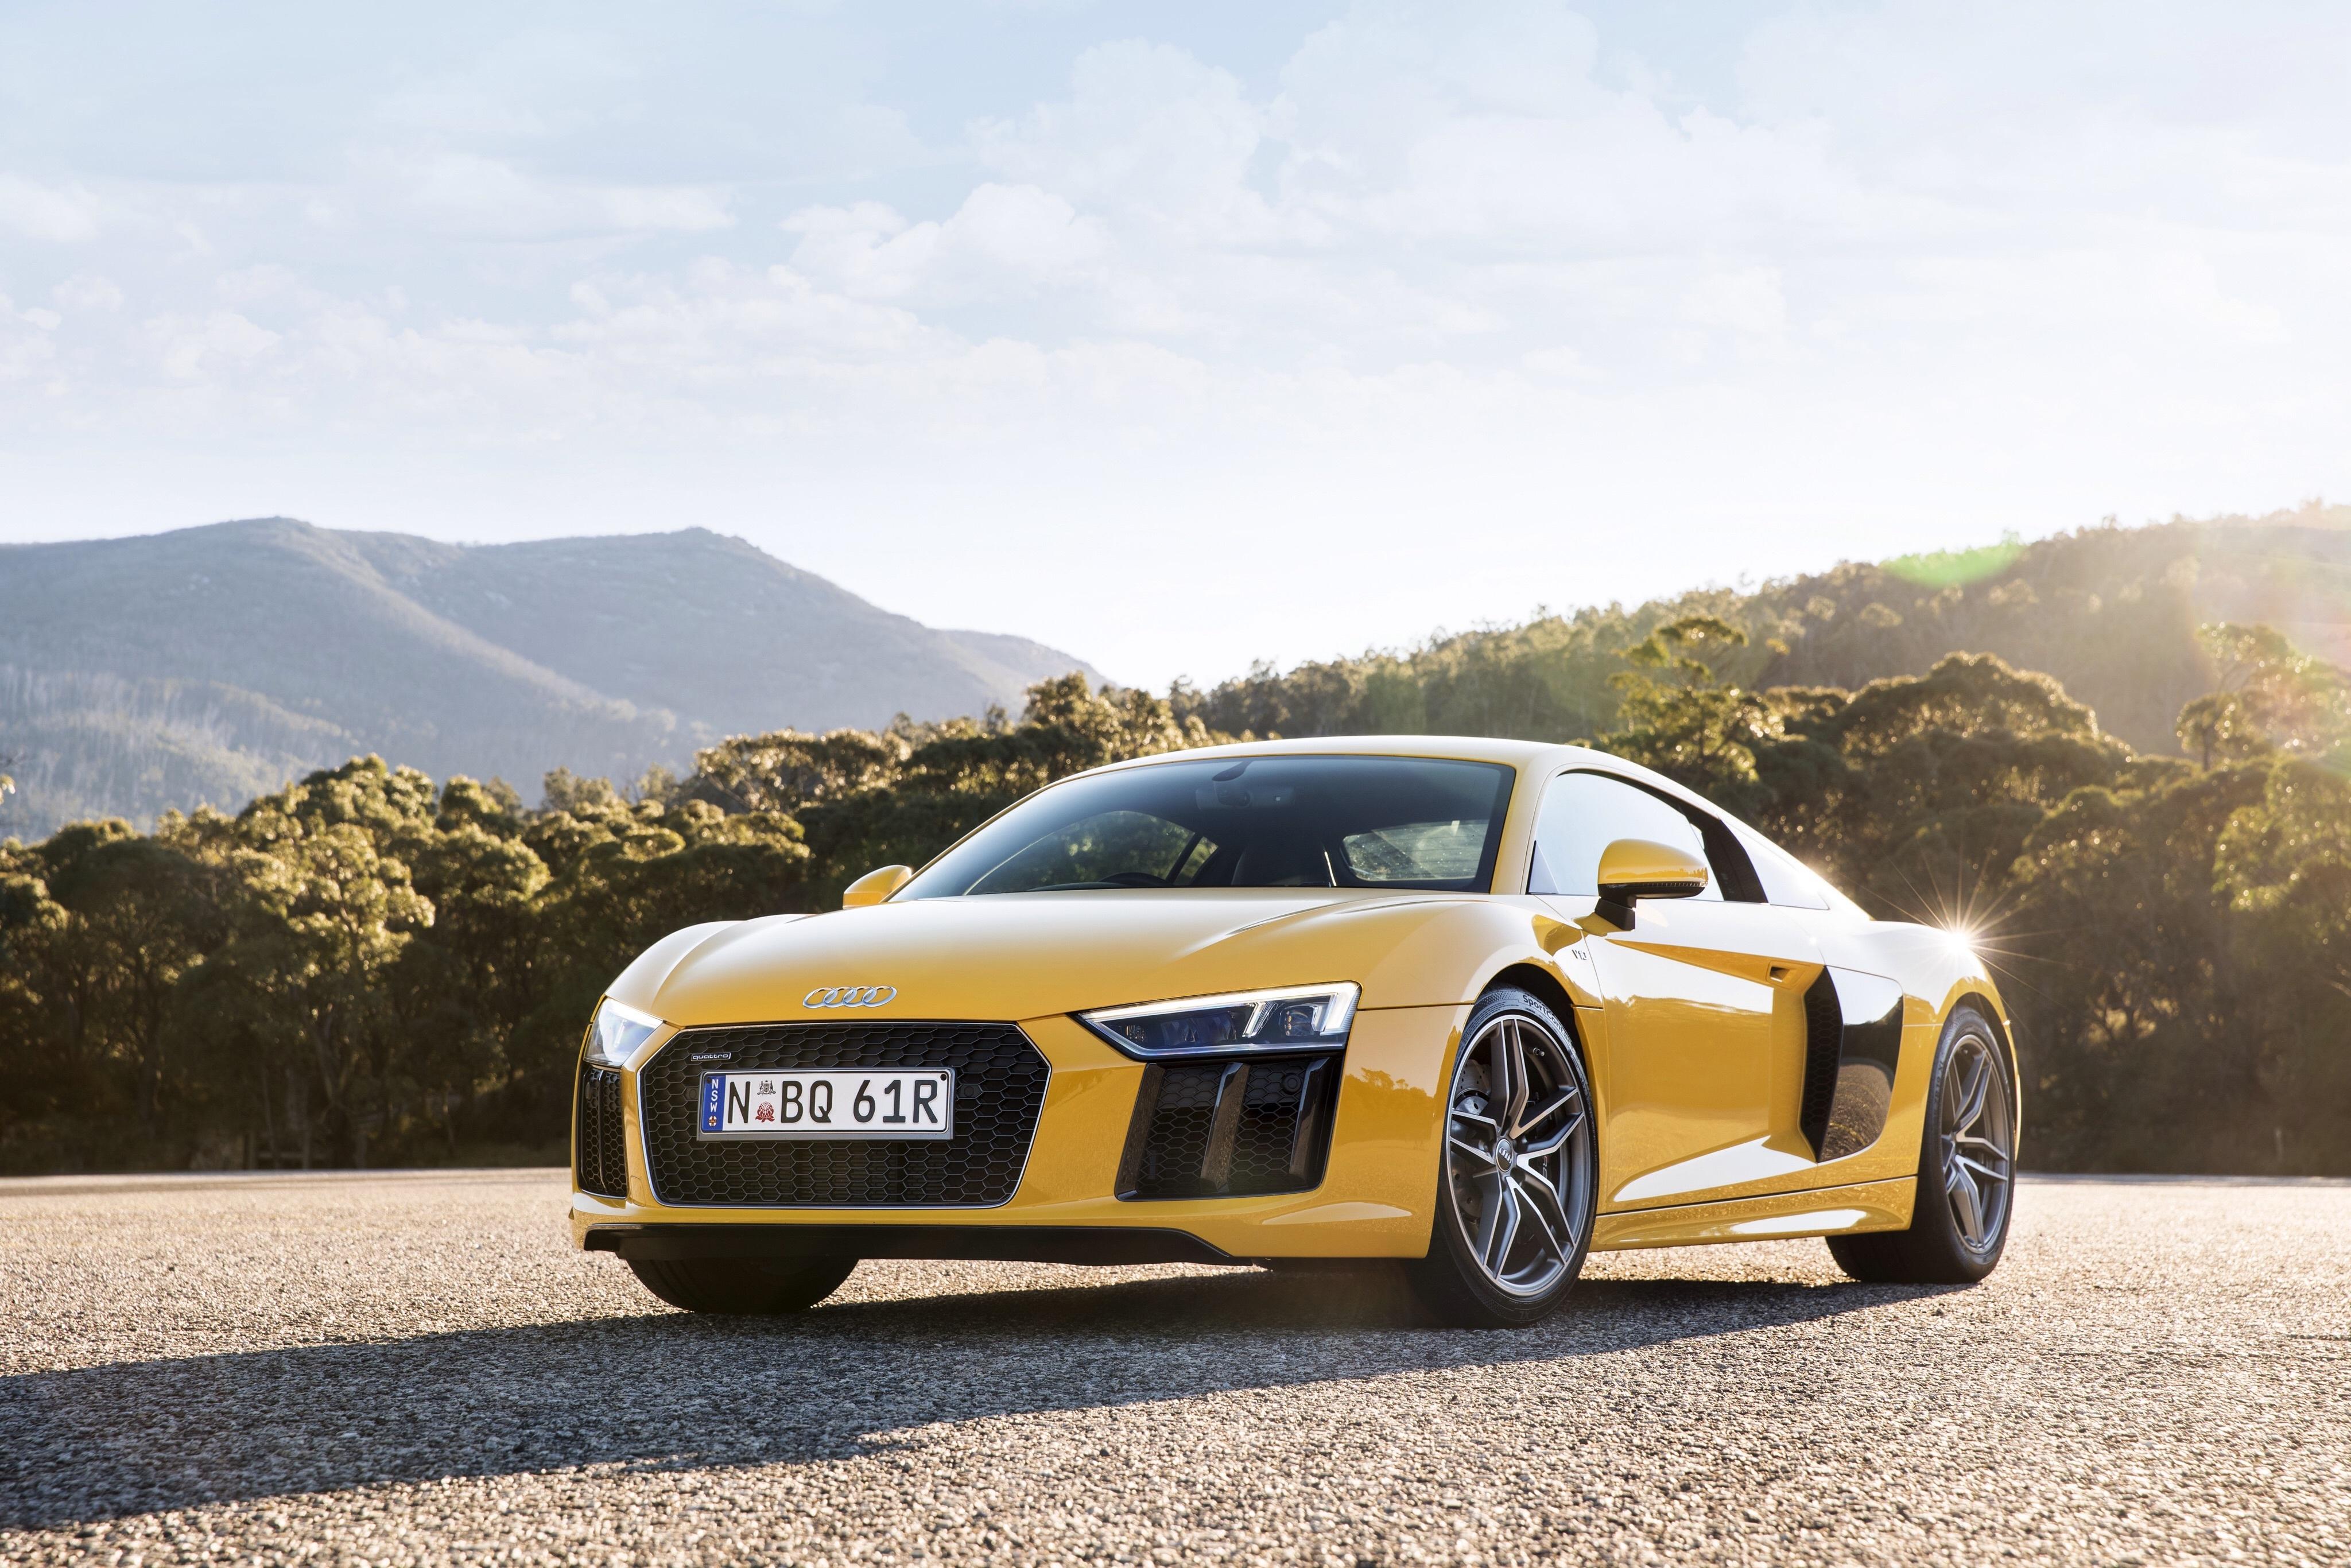 Vehicles   Audi R8 Audi R8 V10 Yellow Car Sport Car Supercar Car Vehicle  Wallpaper